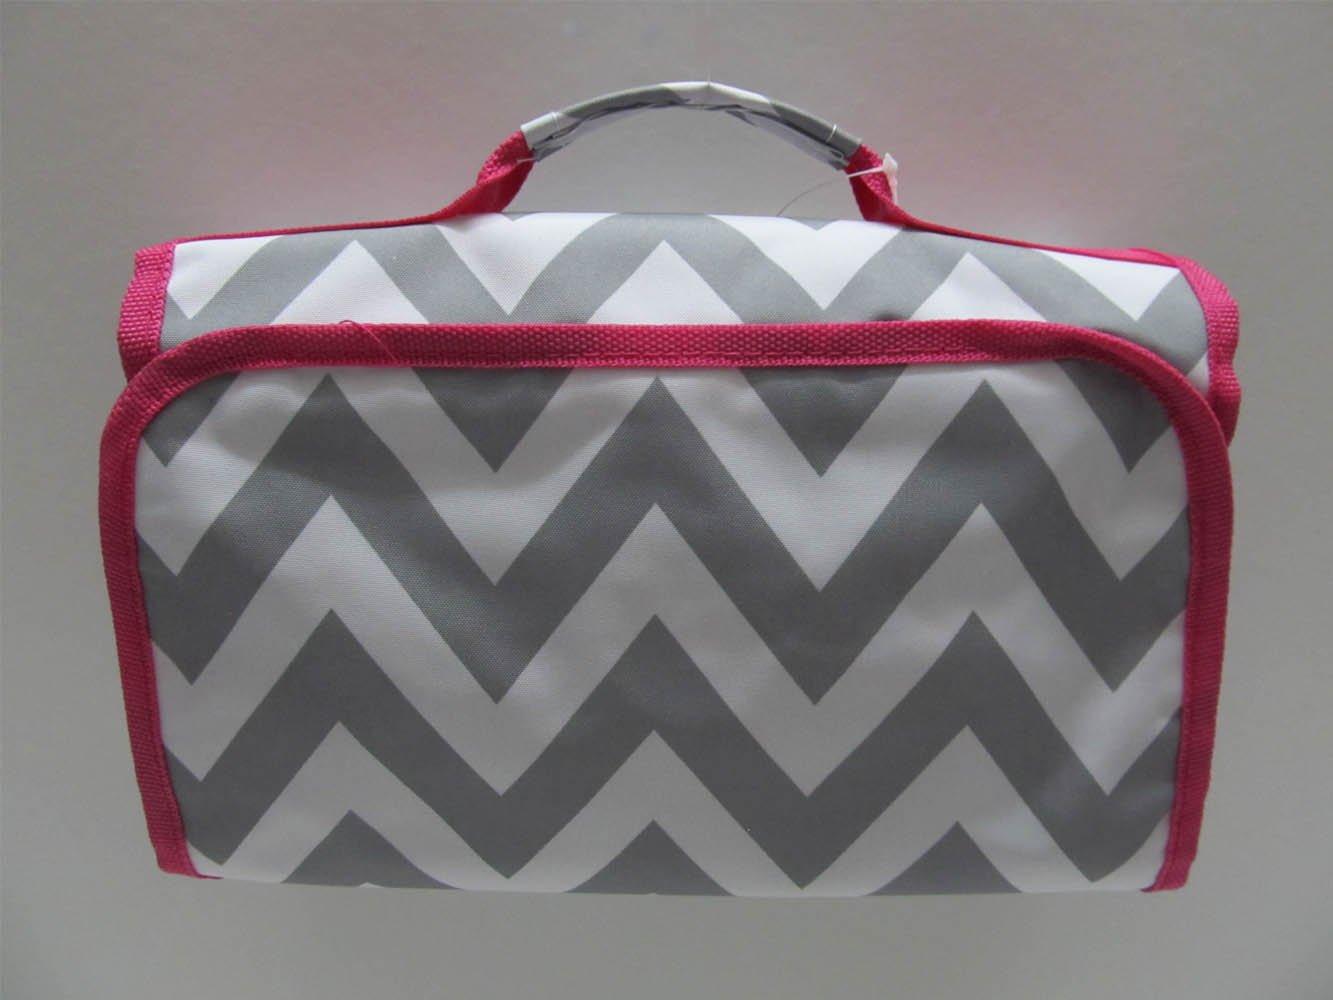 Cosmetic Organizer Travel Makeup Organizer Cosmetic Bag Chevron Gray Pink